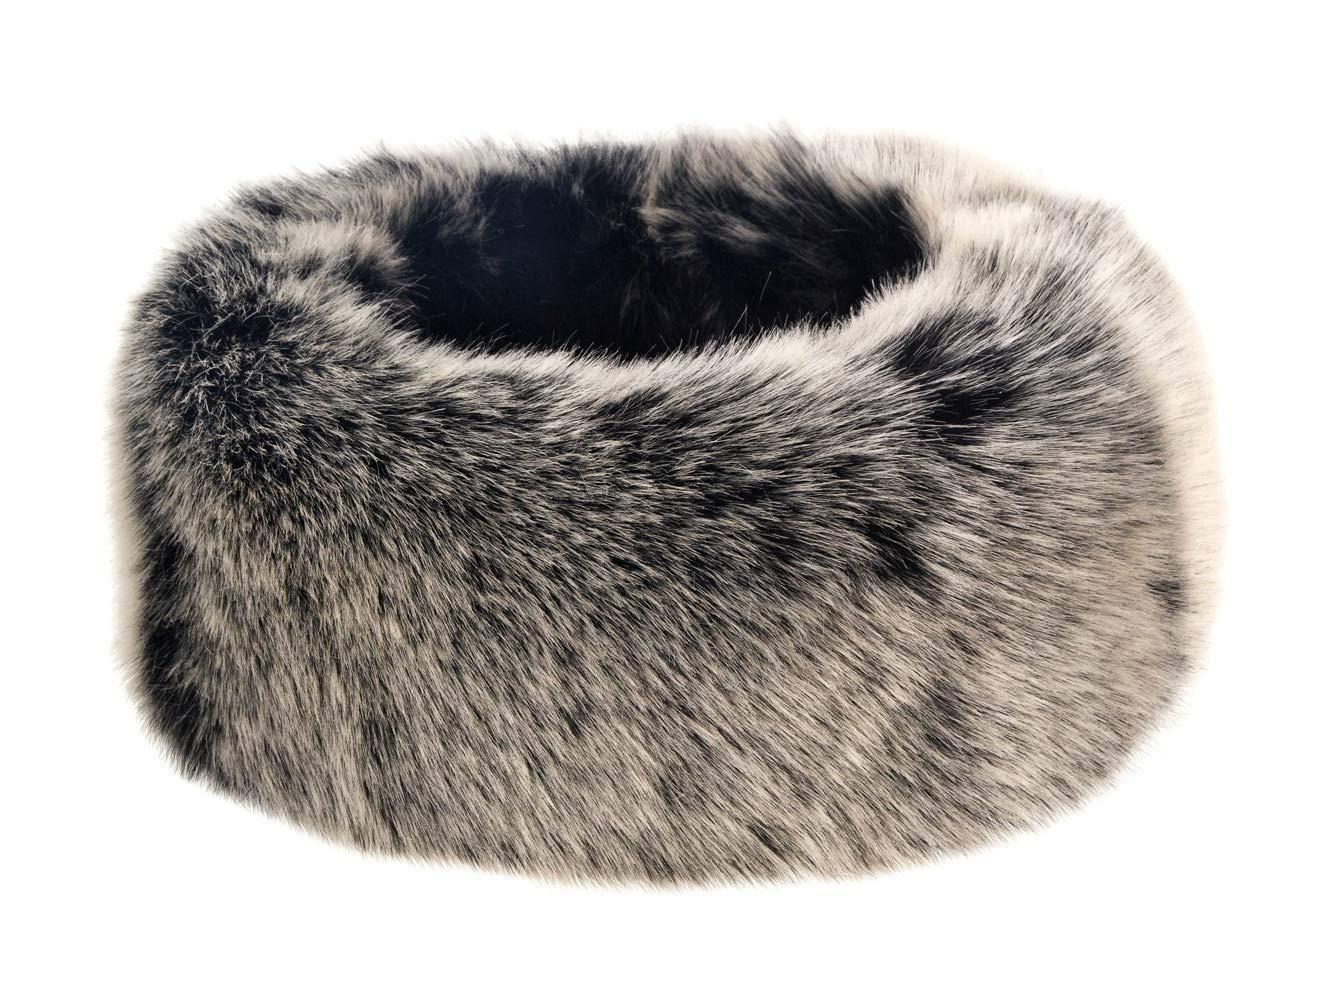 Futrzane Winter Faux Fur Headband for Women and Girls (Siberian Grey) by Futrzane